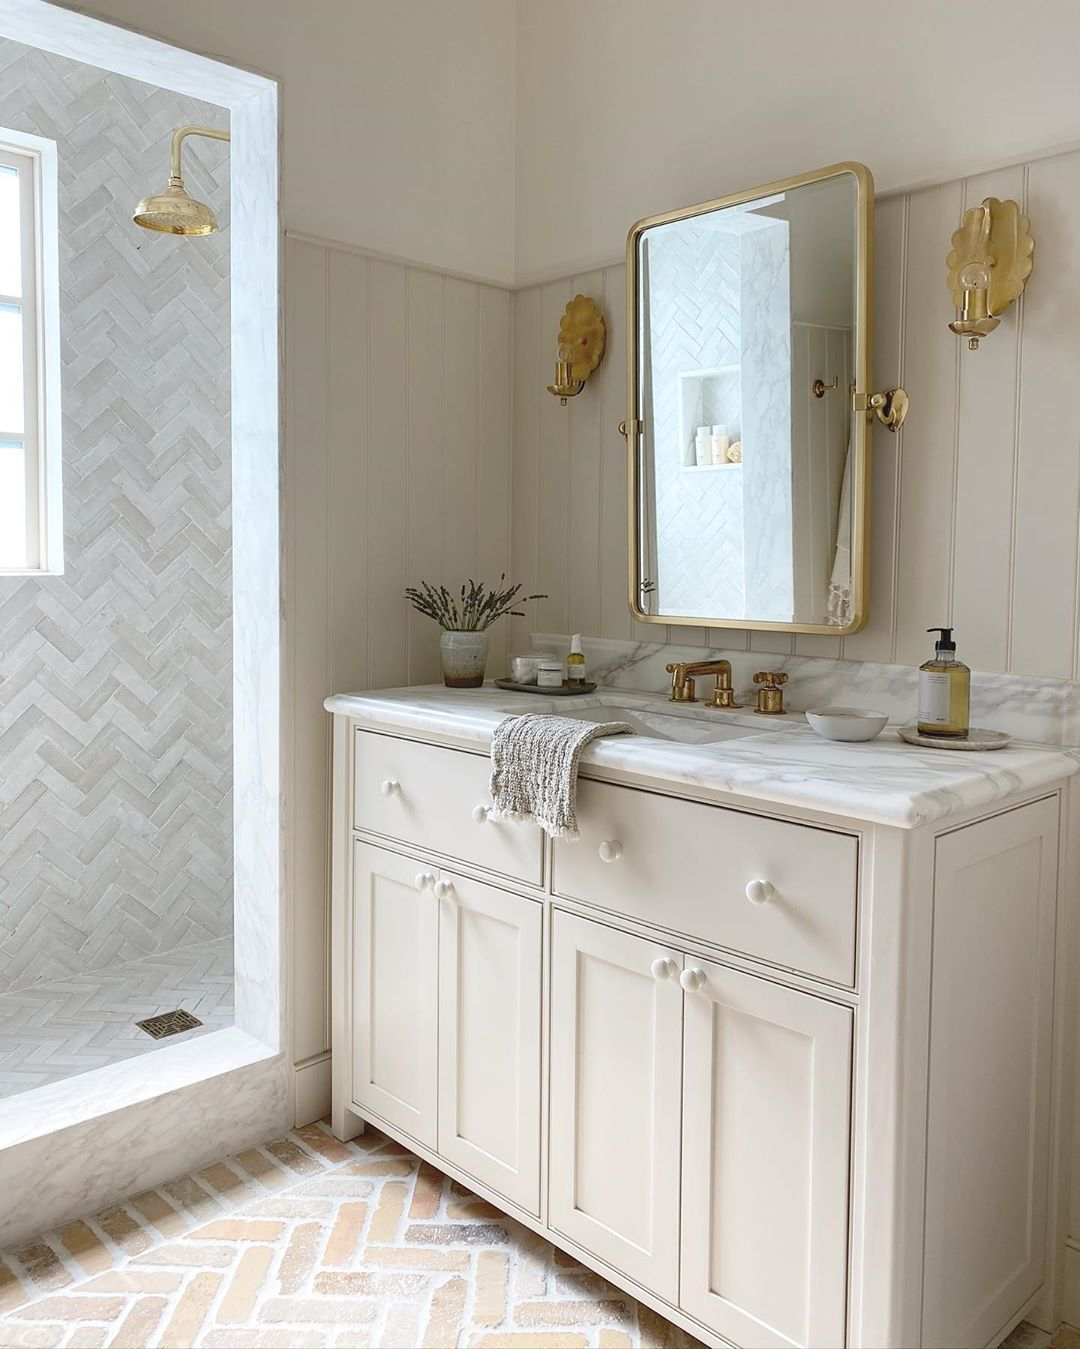 Amber Lewis Amberinteriors Posted On Instagram Jun 25 2020 At 1 29am Utc In 2020 Bathroom Decor Bathroom Inspiration Shower Doors